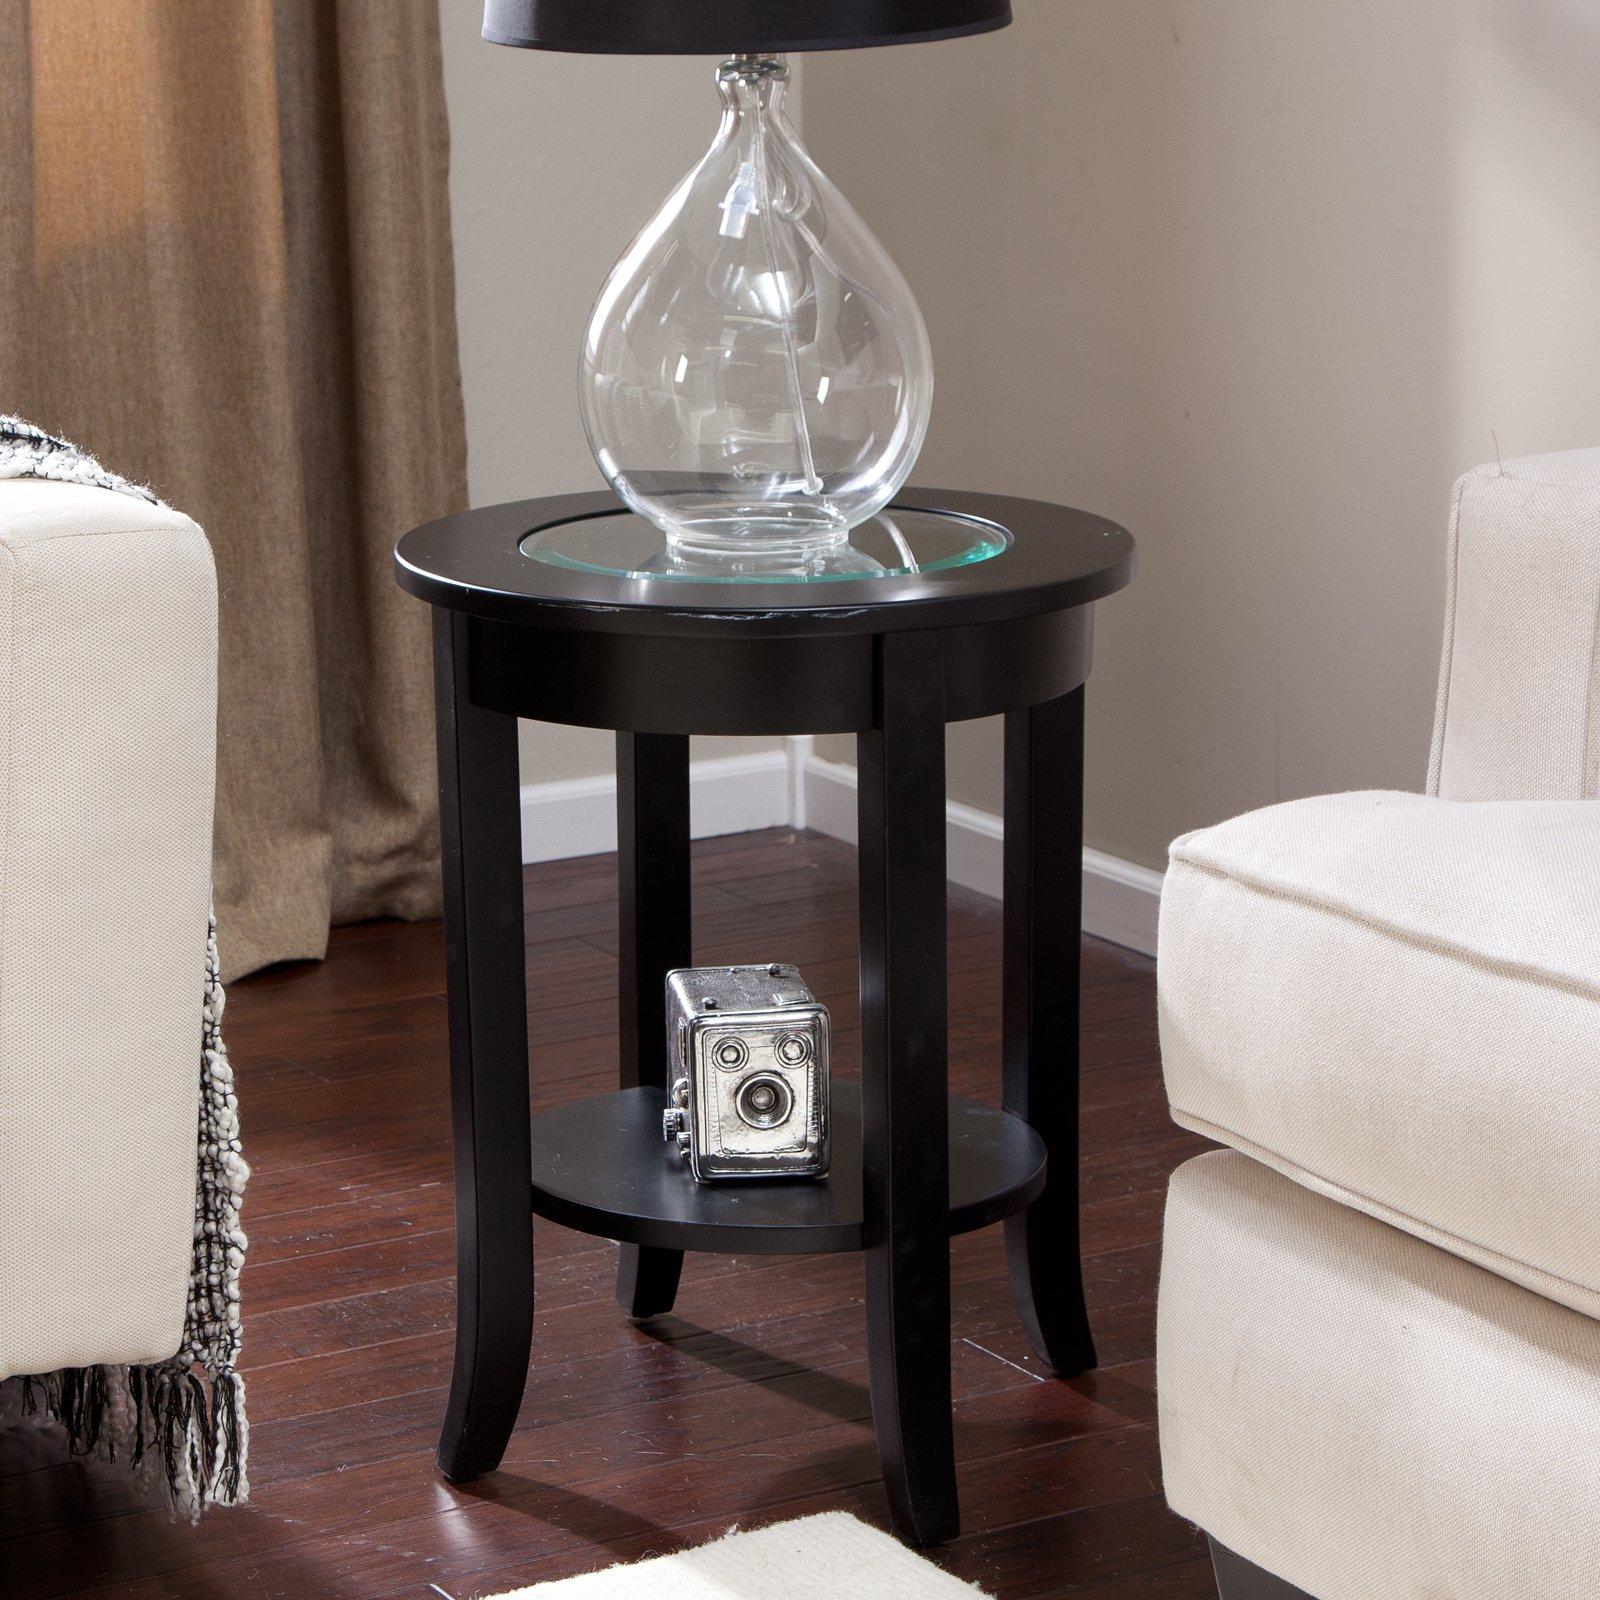 interior center furniture black lamps design designer modern small tables sets living side end set table room designs accent target for including hexagon full size retro designers